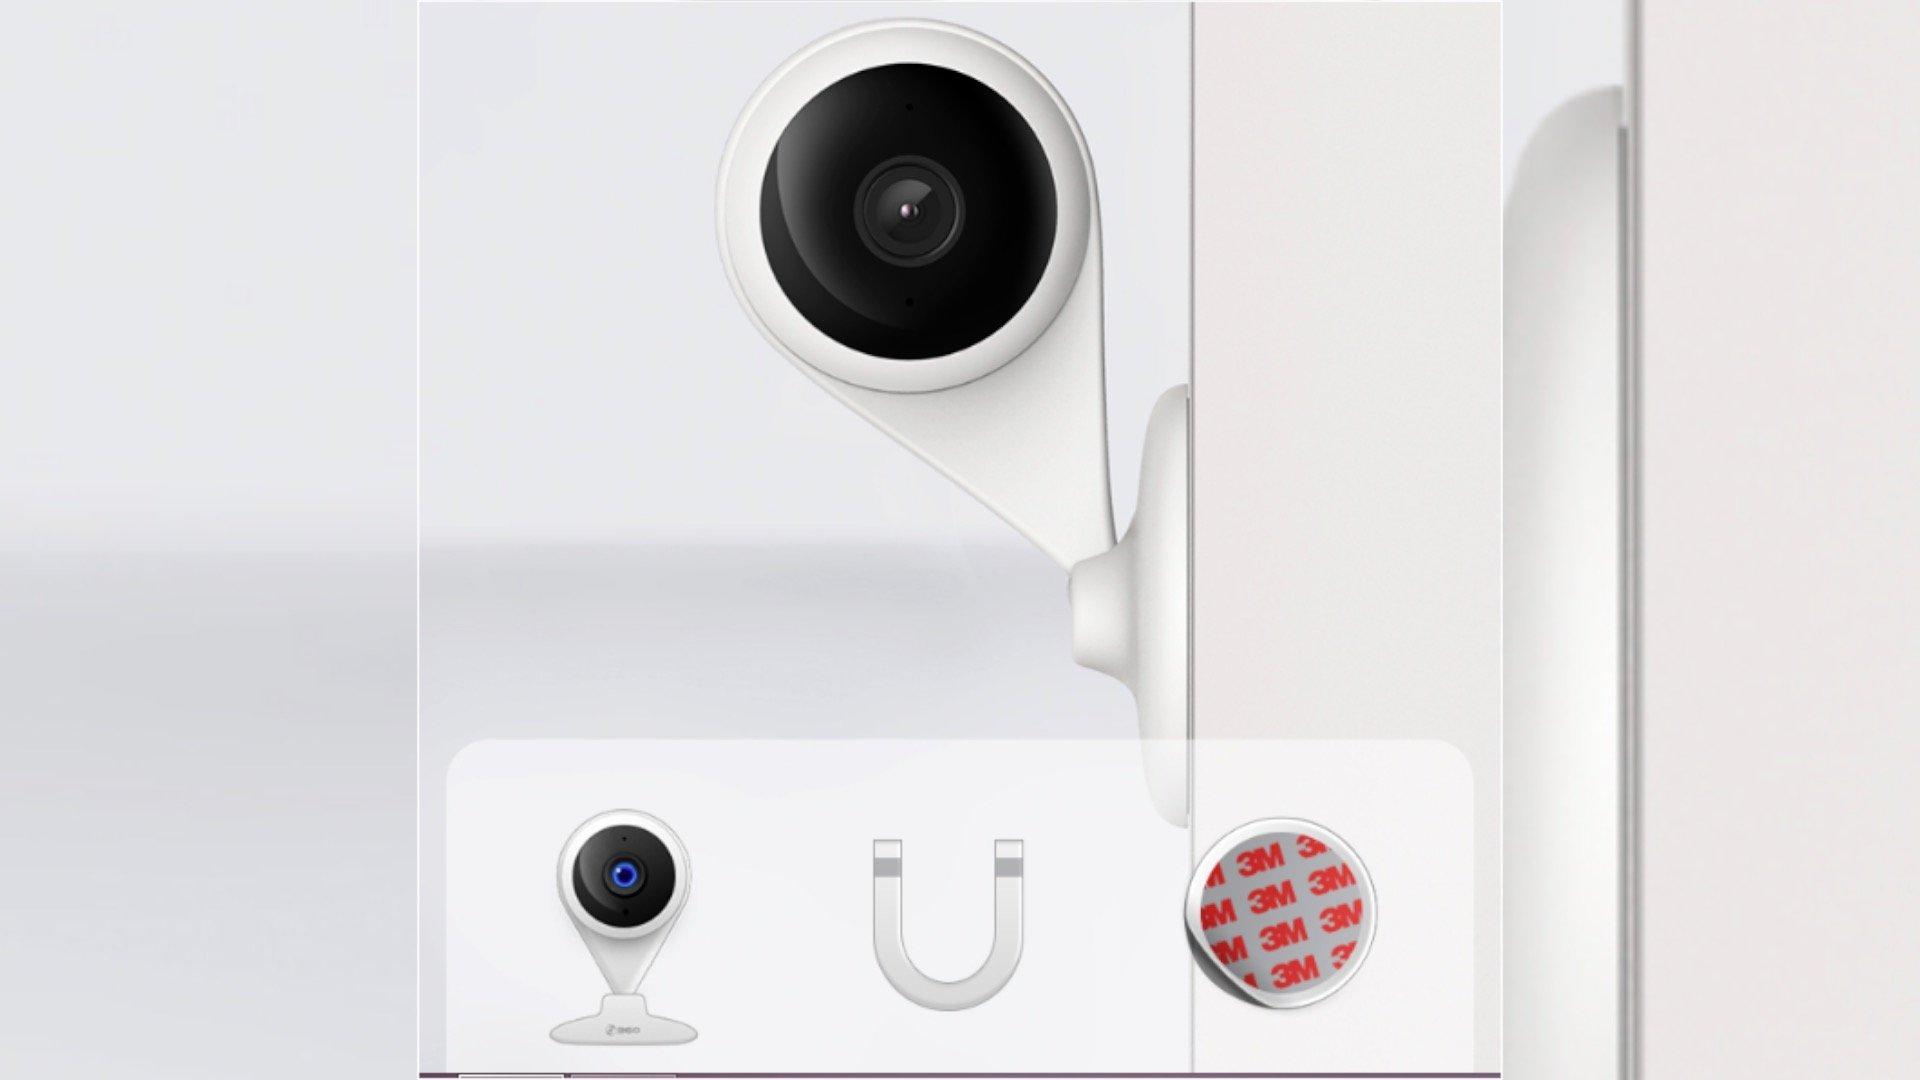 360 Smart Camera AI